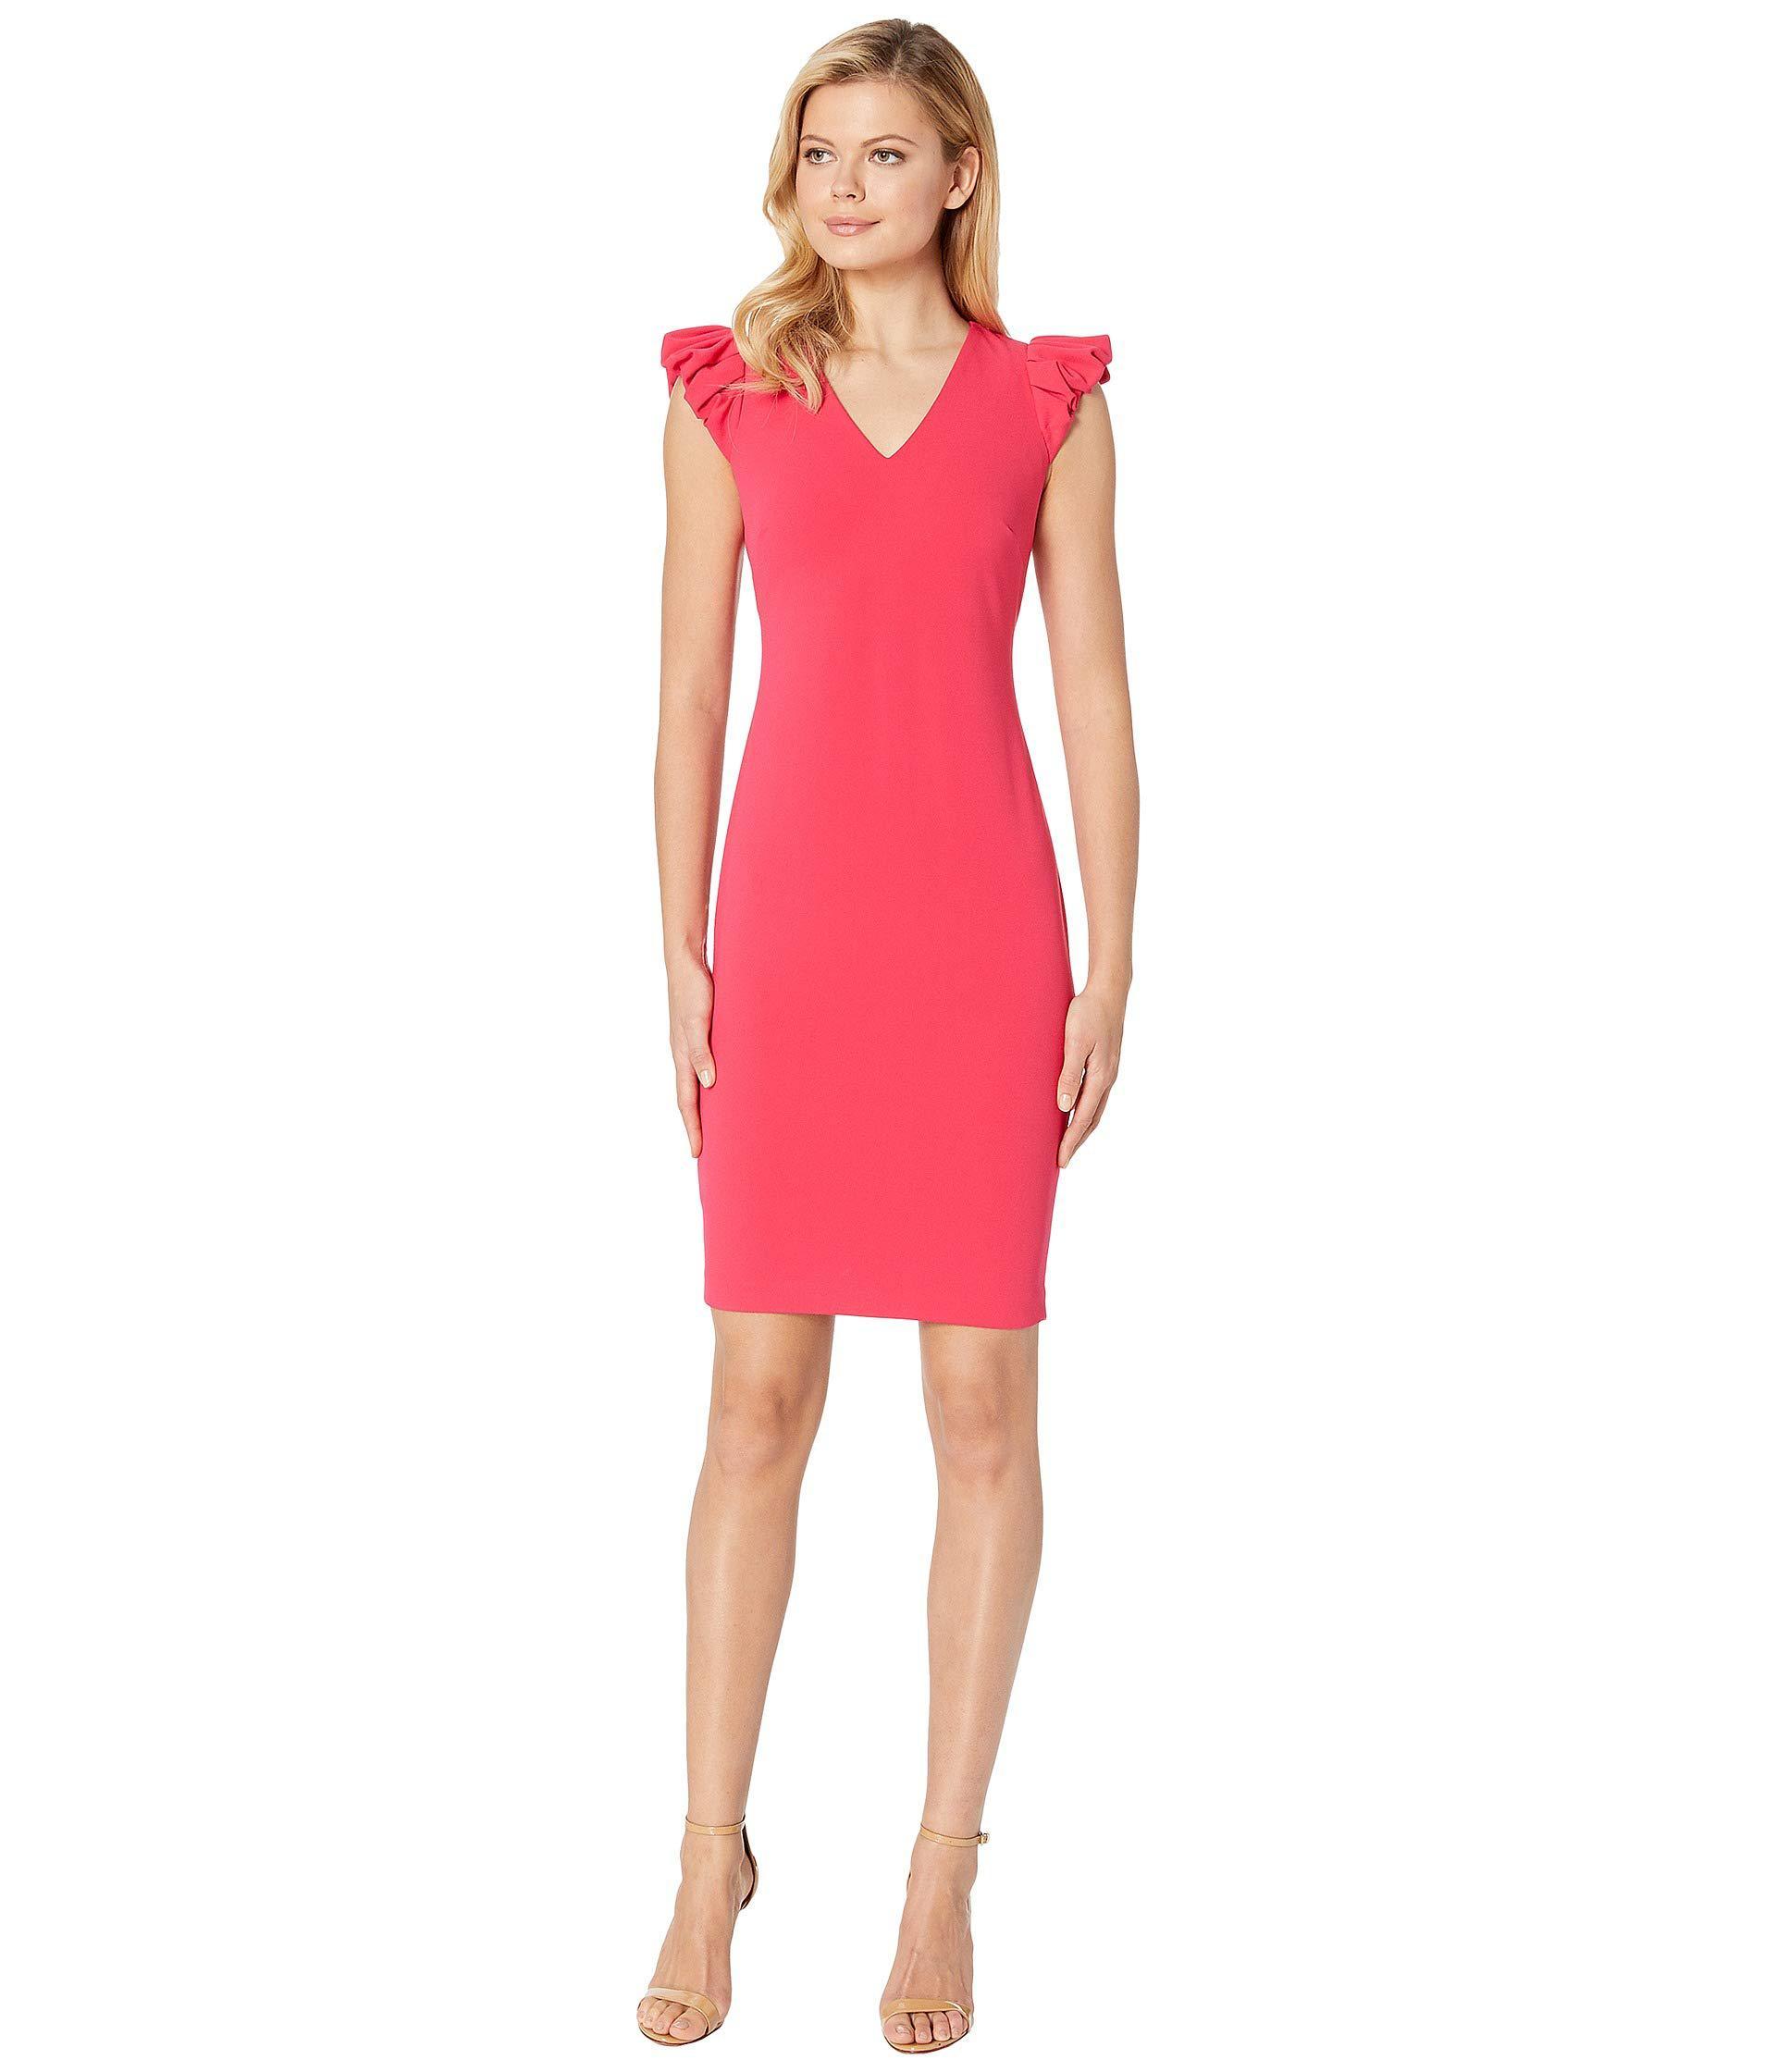 522c844a18a78 Calvin Klein - Pink Puff Sleeve V-neck Sheath Dress Cd8c13gy (lipstick)  Women s. View fullscreen